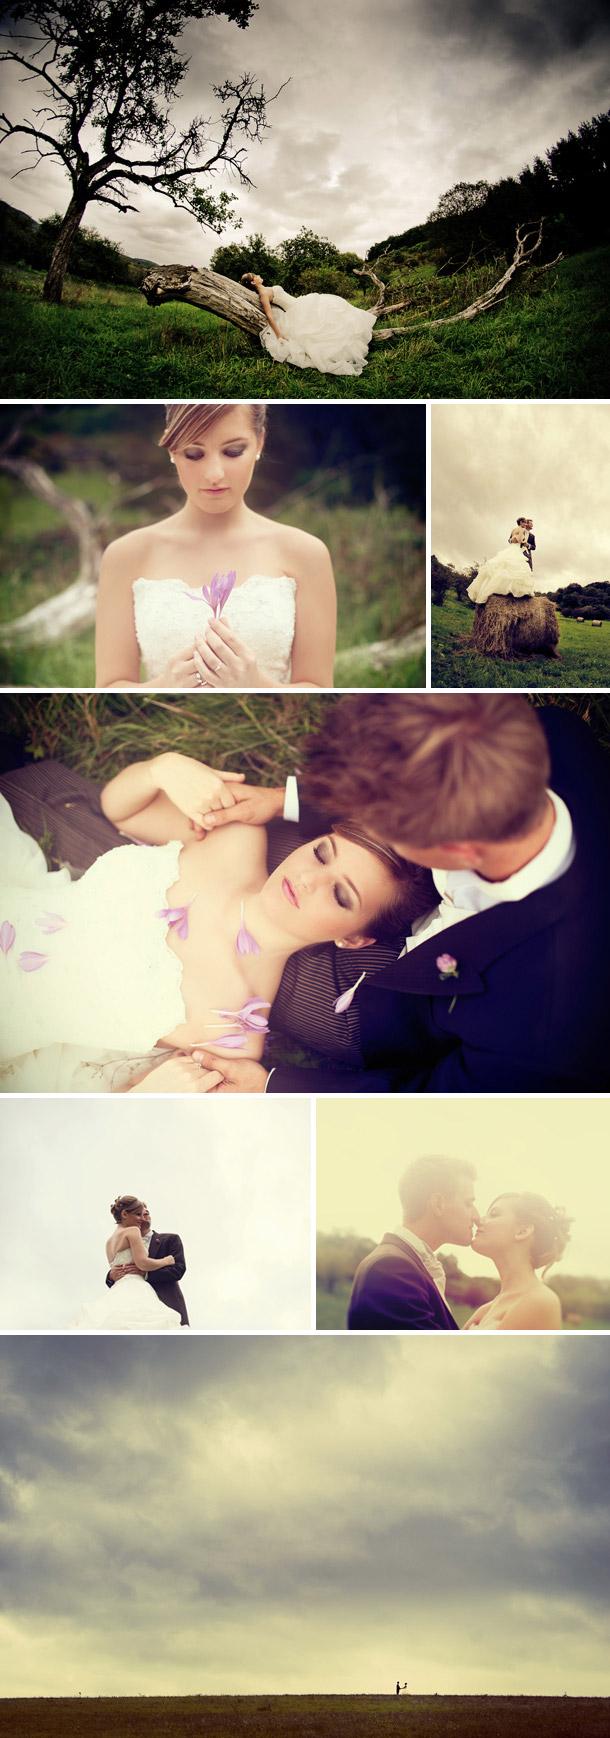 After-Wedding-Shooting bei Hochzeitsfotograf Dominik Peter